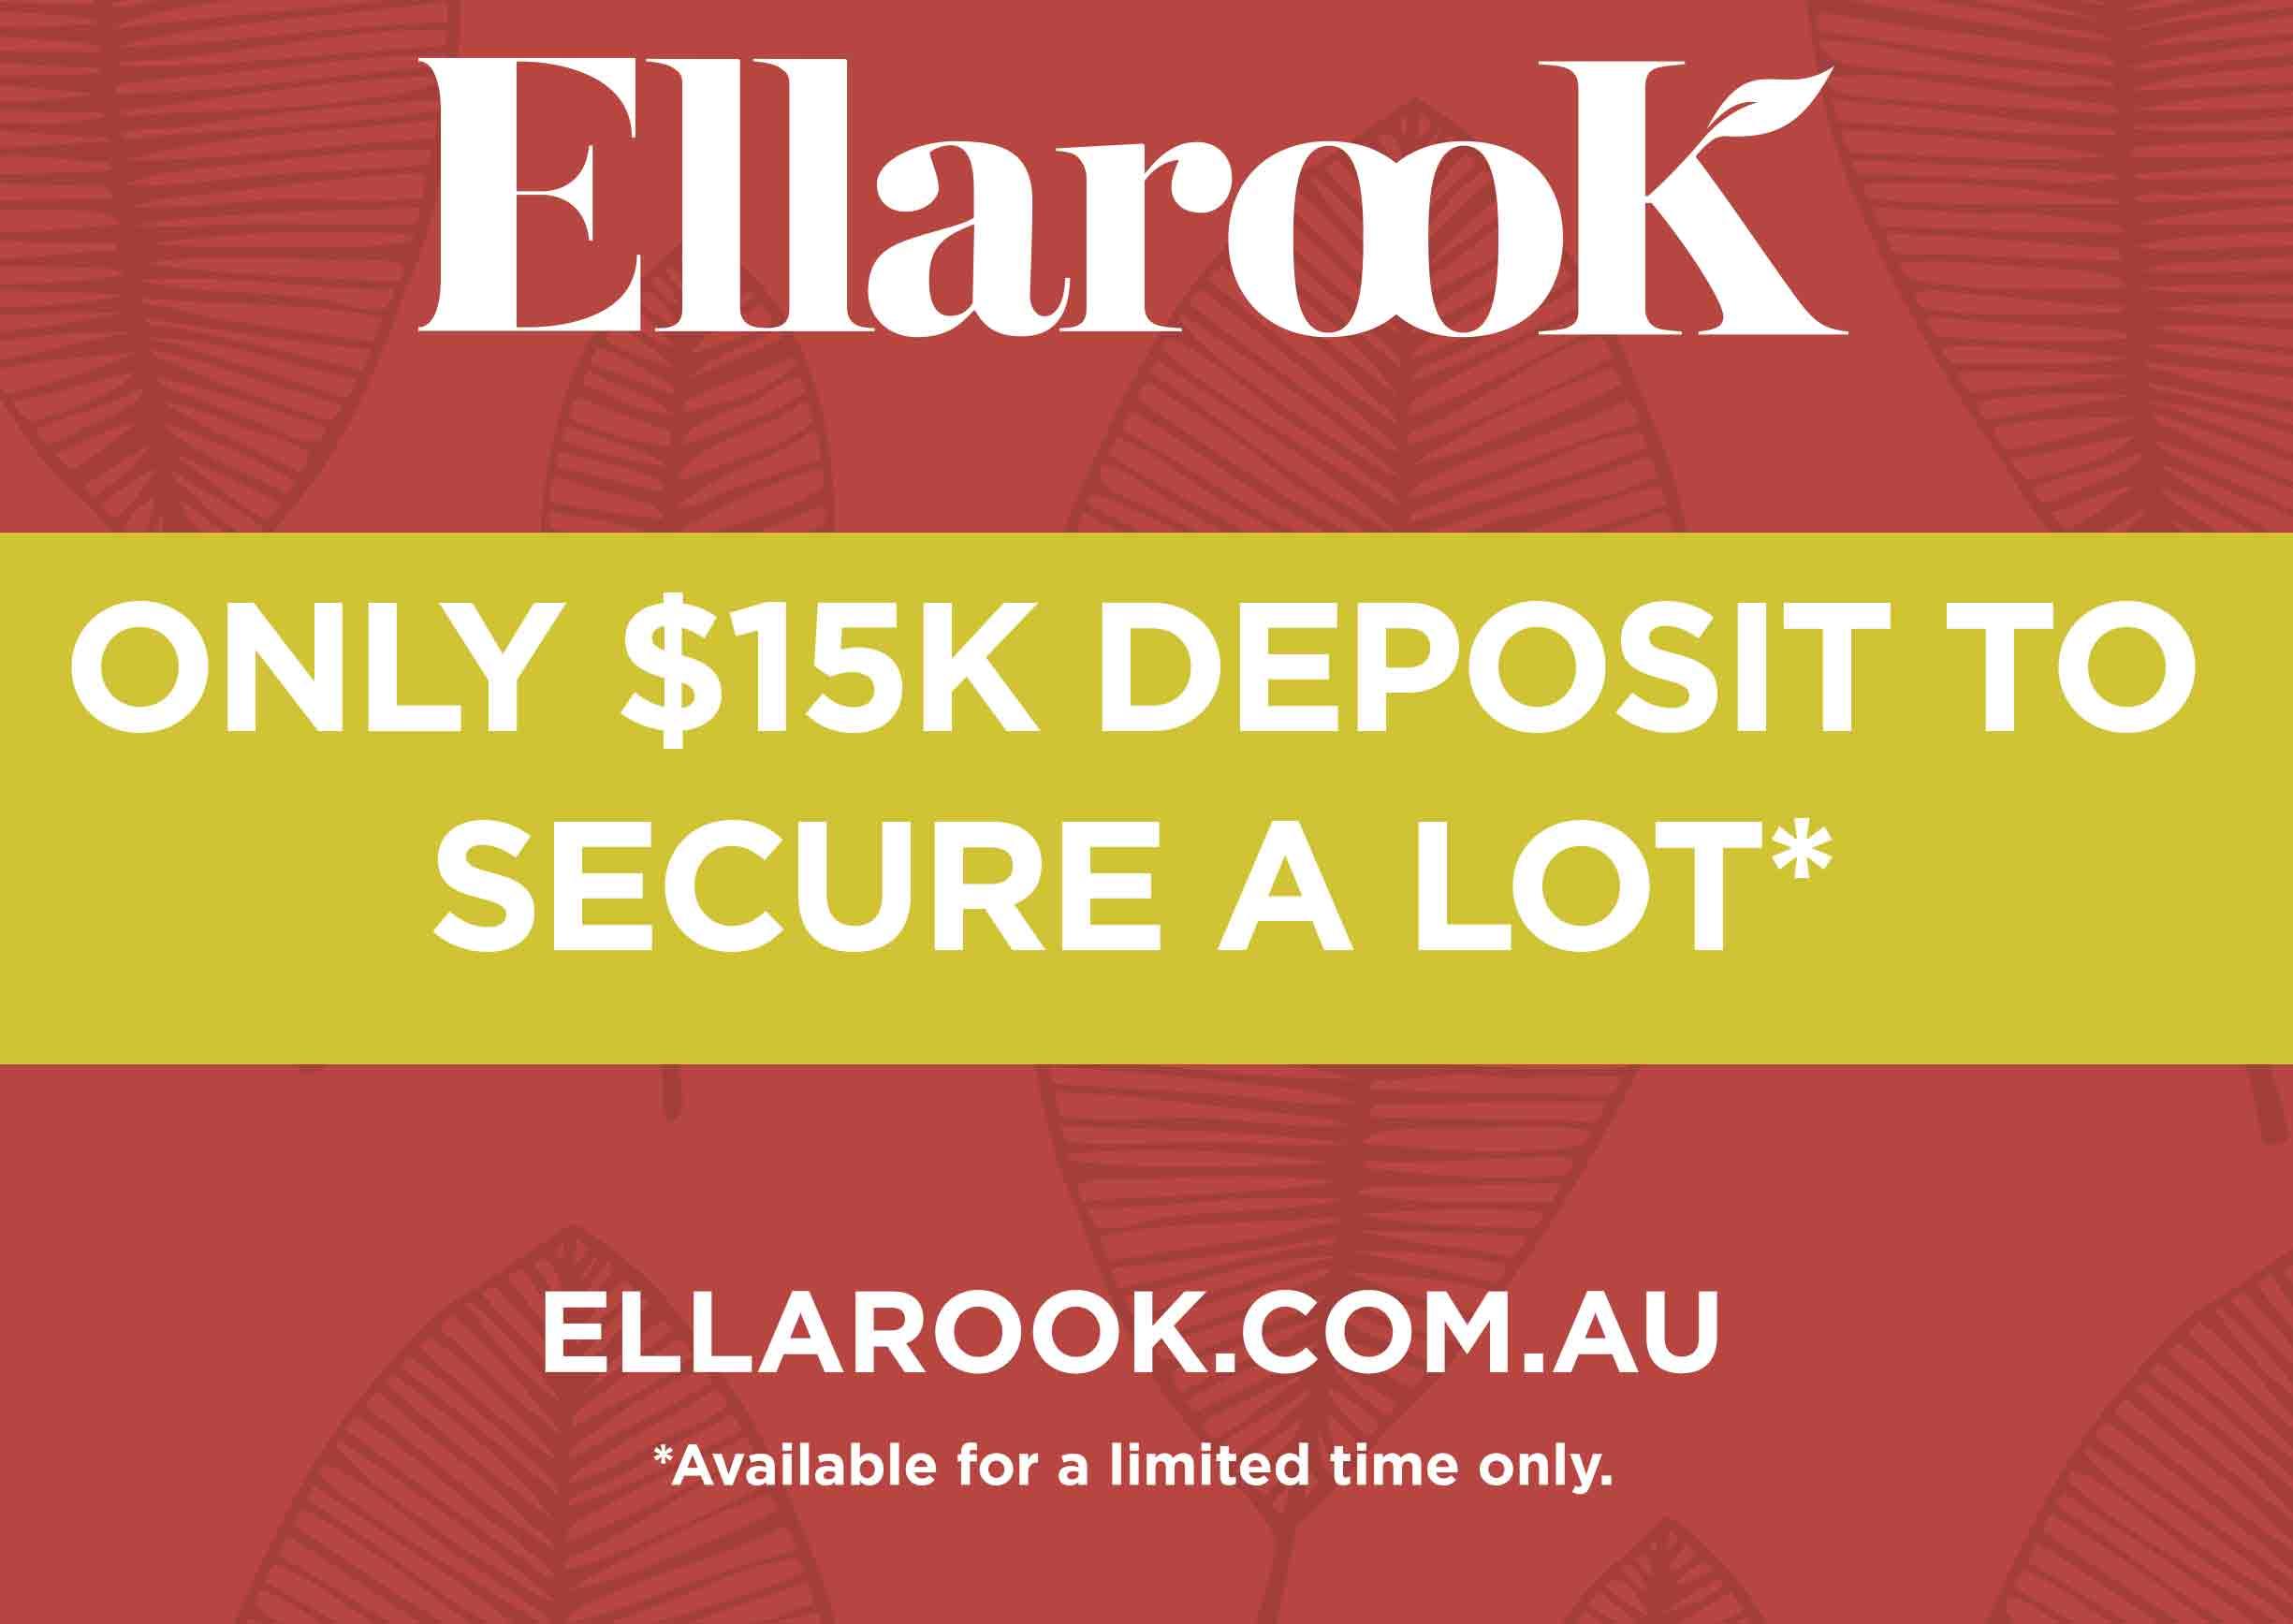 7829-AW01_Ellarook-15k-REA-Project-Profile-2000px-x-1500px_without-IP-logo